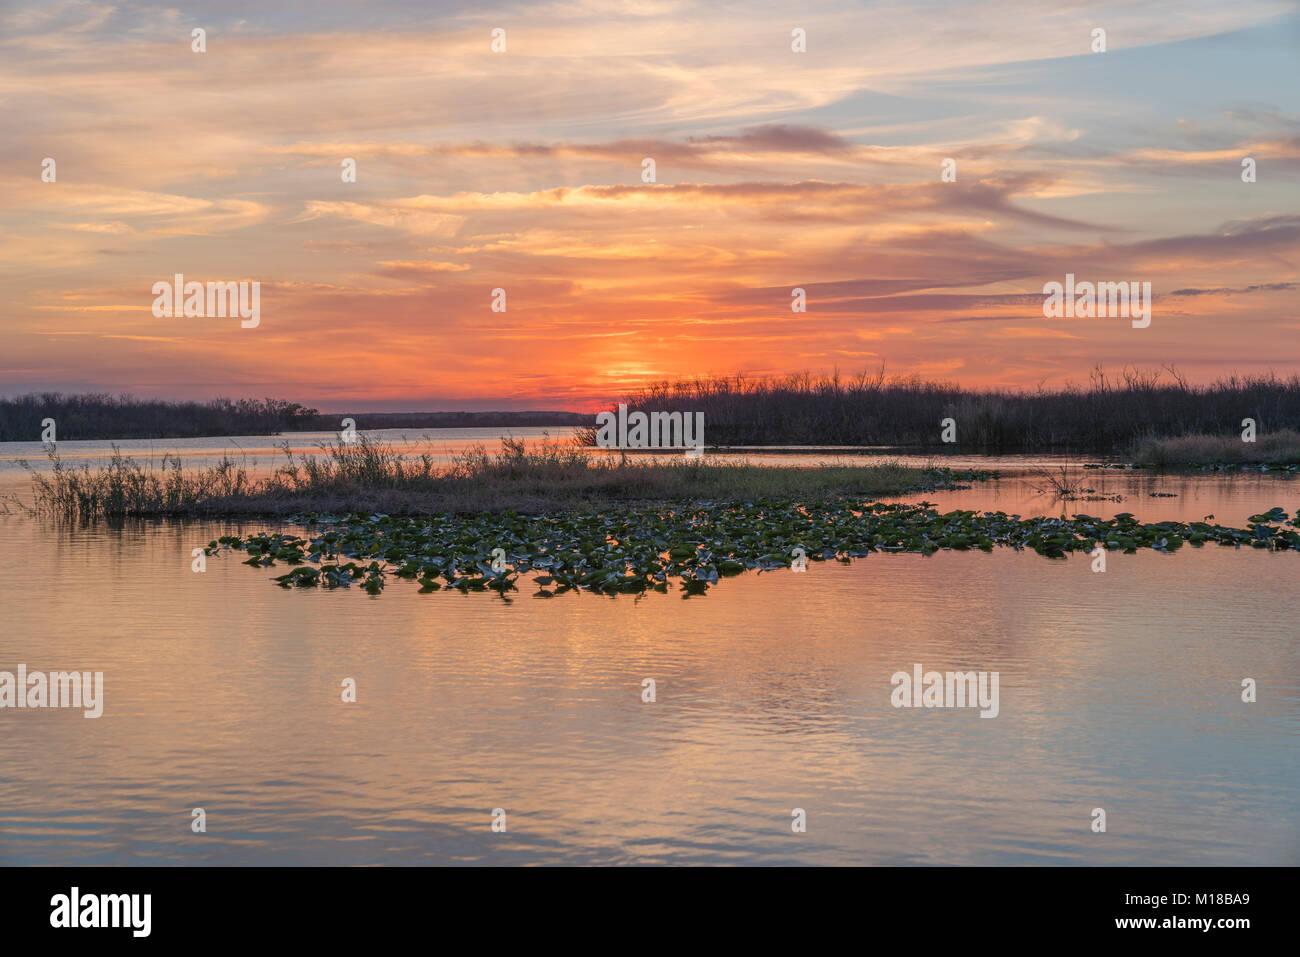 Sunrise melbourne stock photos sunrise melbourne stock for St johns river fish camps